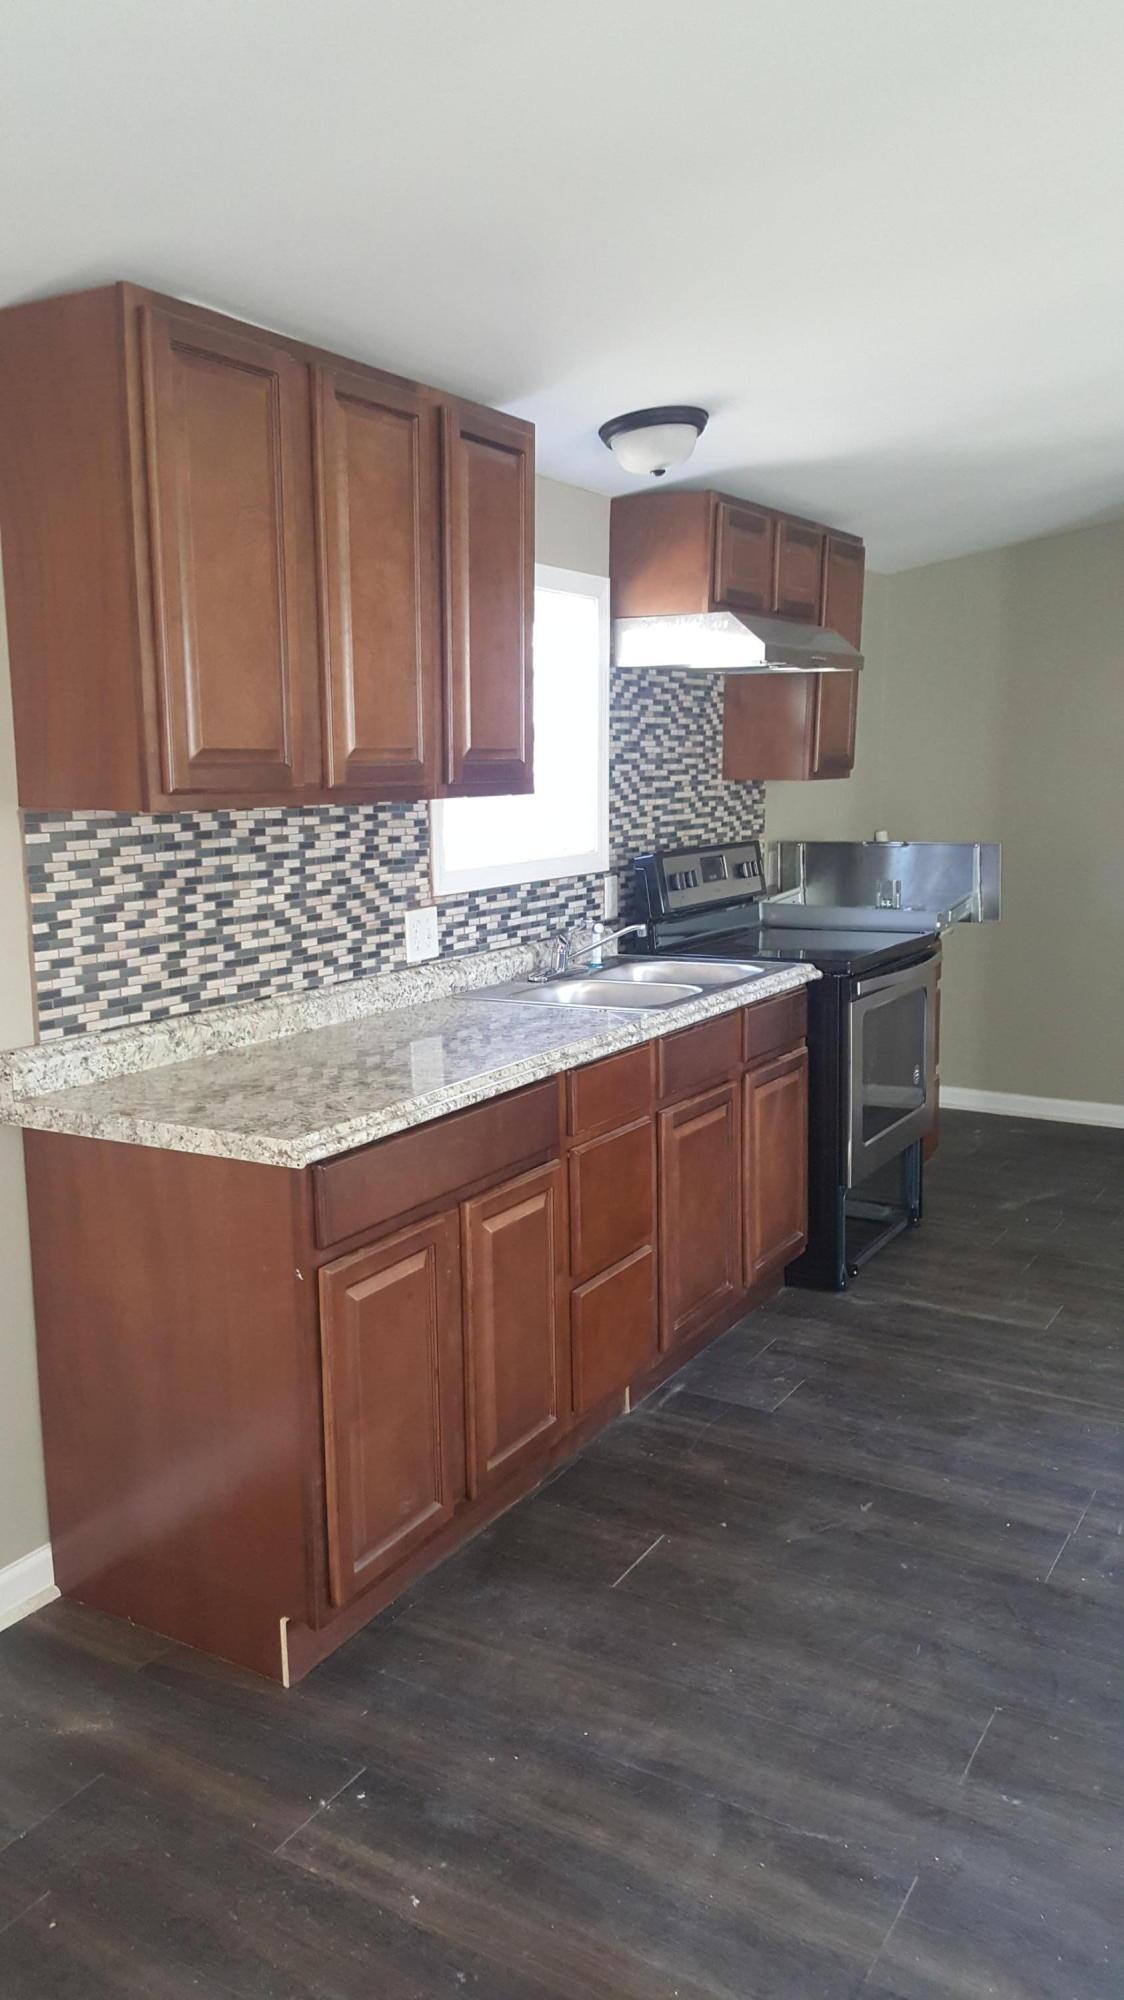 Deer Park Homes For Sale - 2982 Edbillellis, Charleston, SC - 3